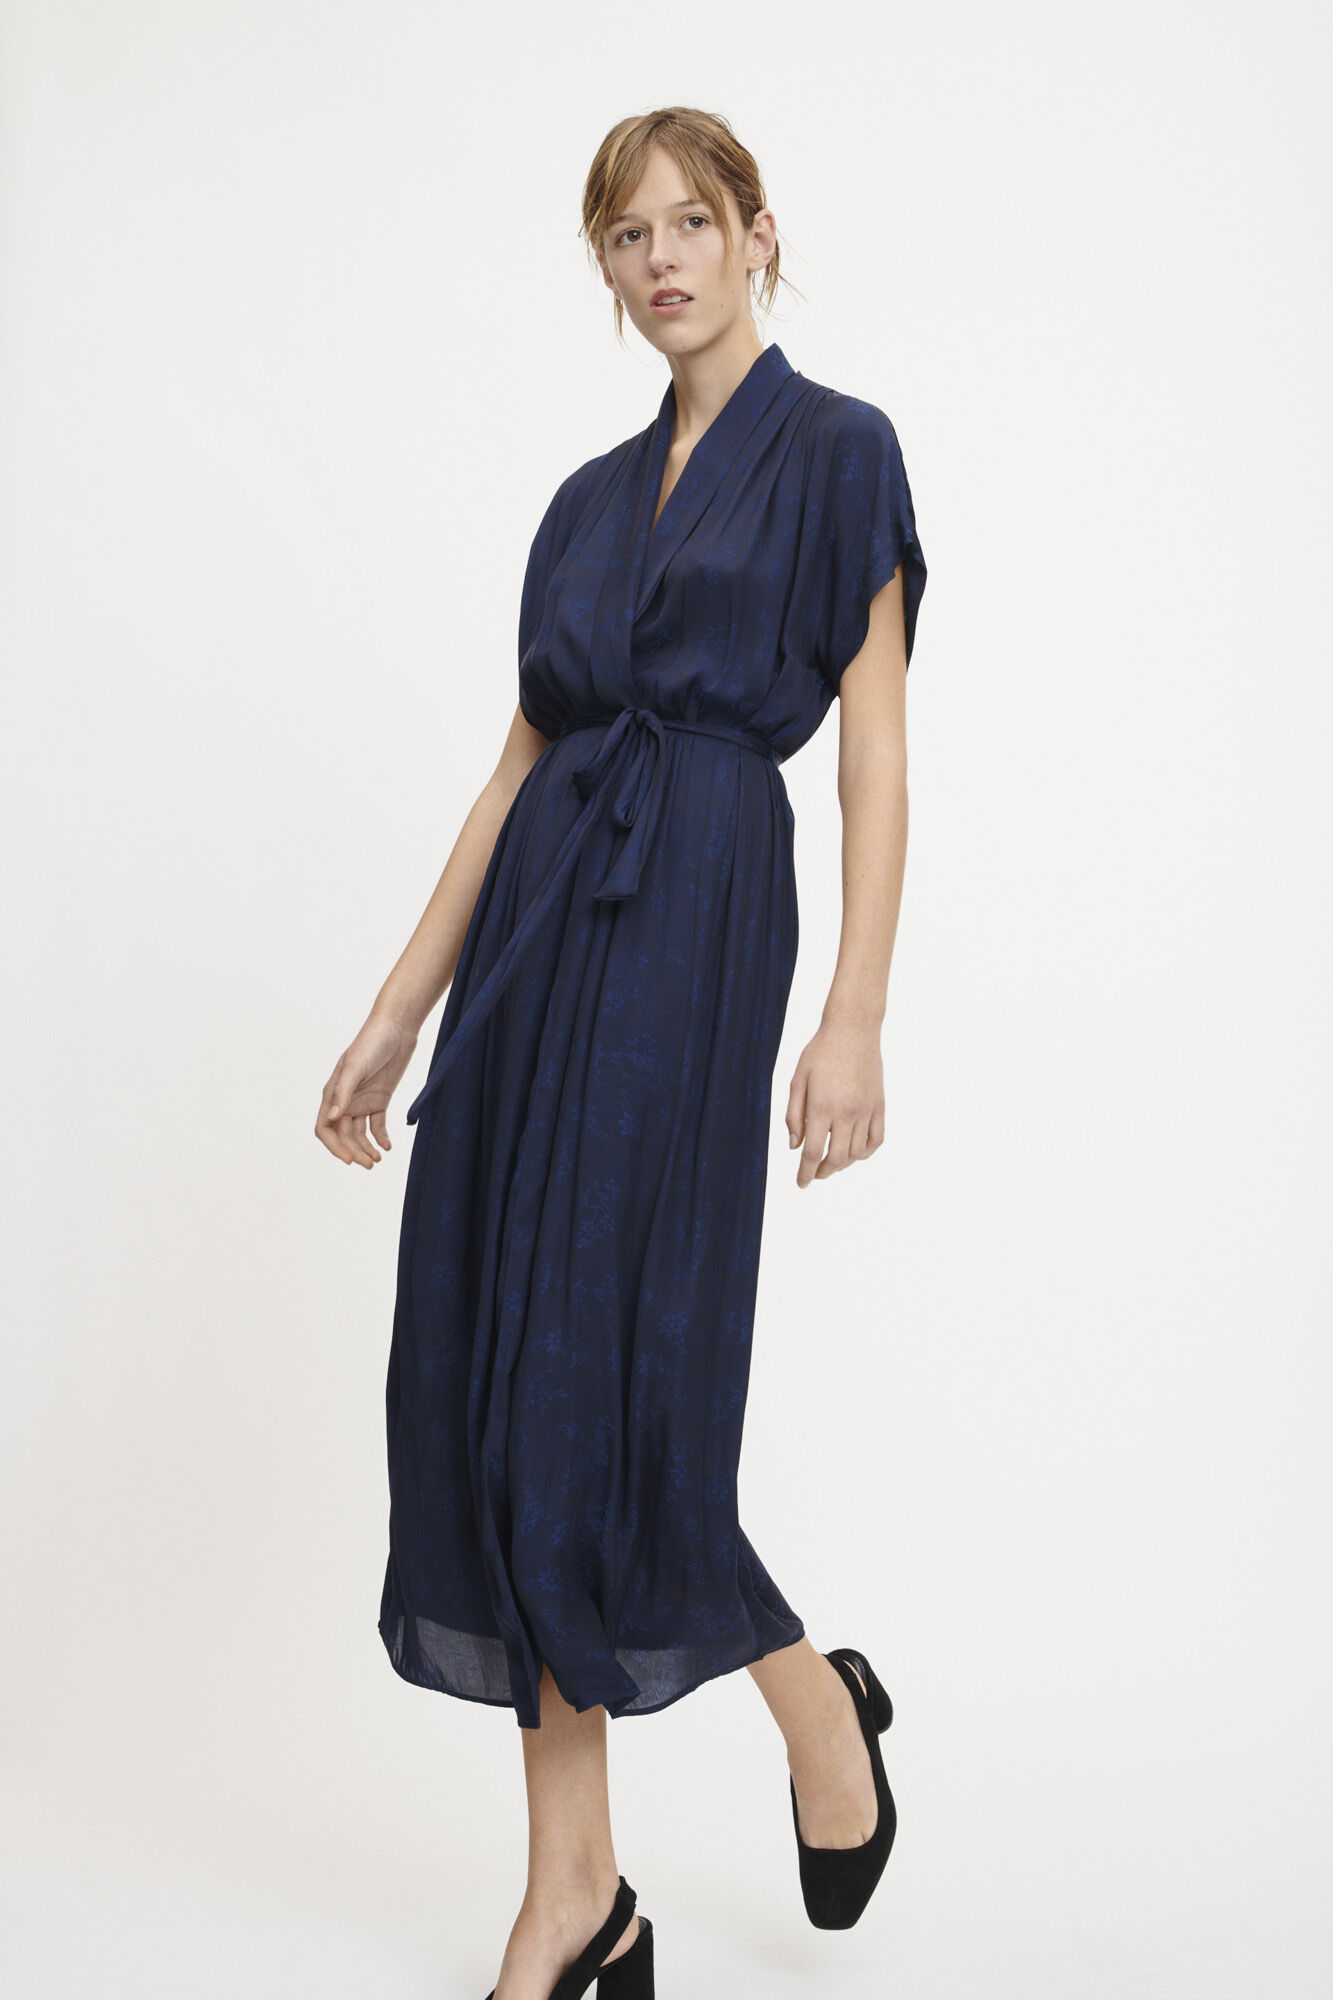 Dresses Women's Samsøe® StoreSamsøeamp; Dresses StoreSamsøeamp; Maxi Women's Women's Maxi Maxi Samsøe® Dresses PXwN0nO8k